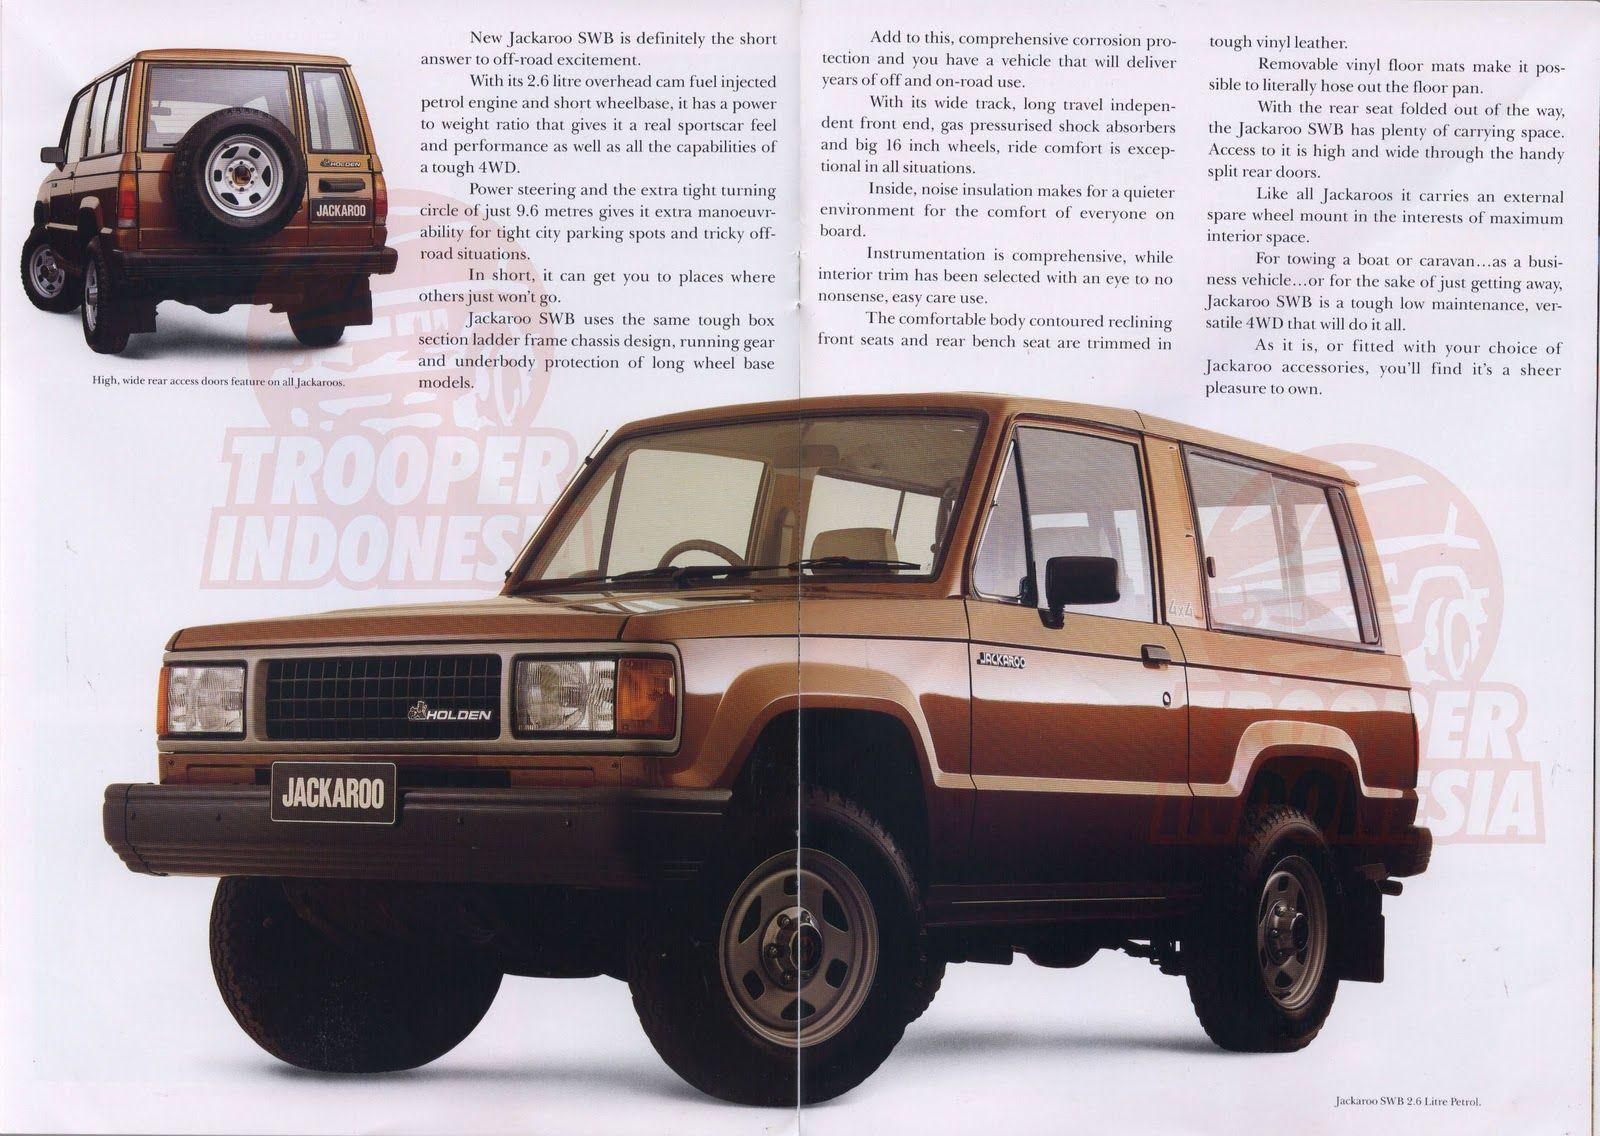 Holden_Jackaroo_1988_p10.jpg